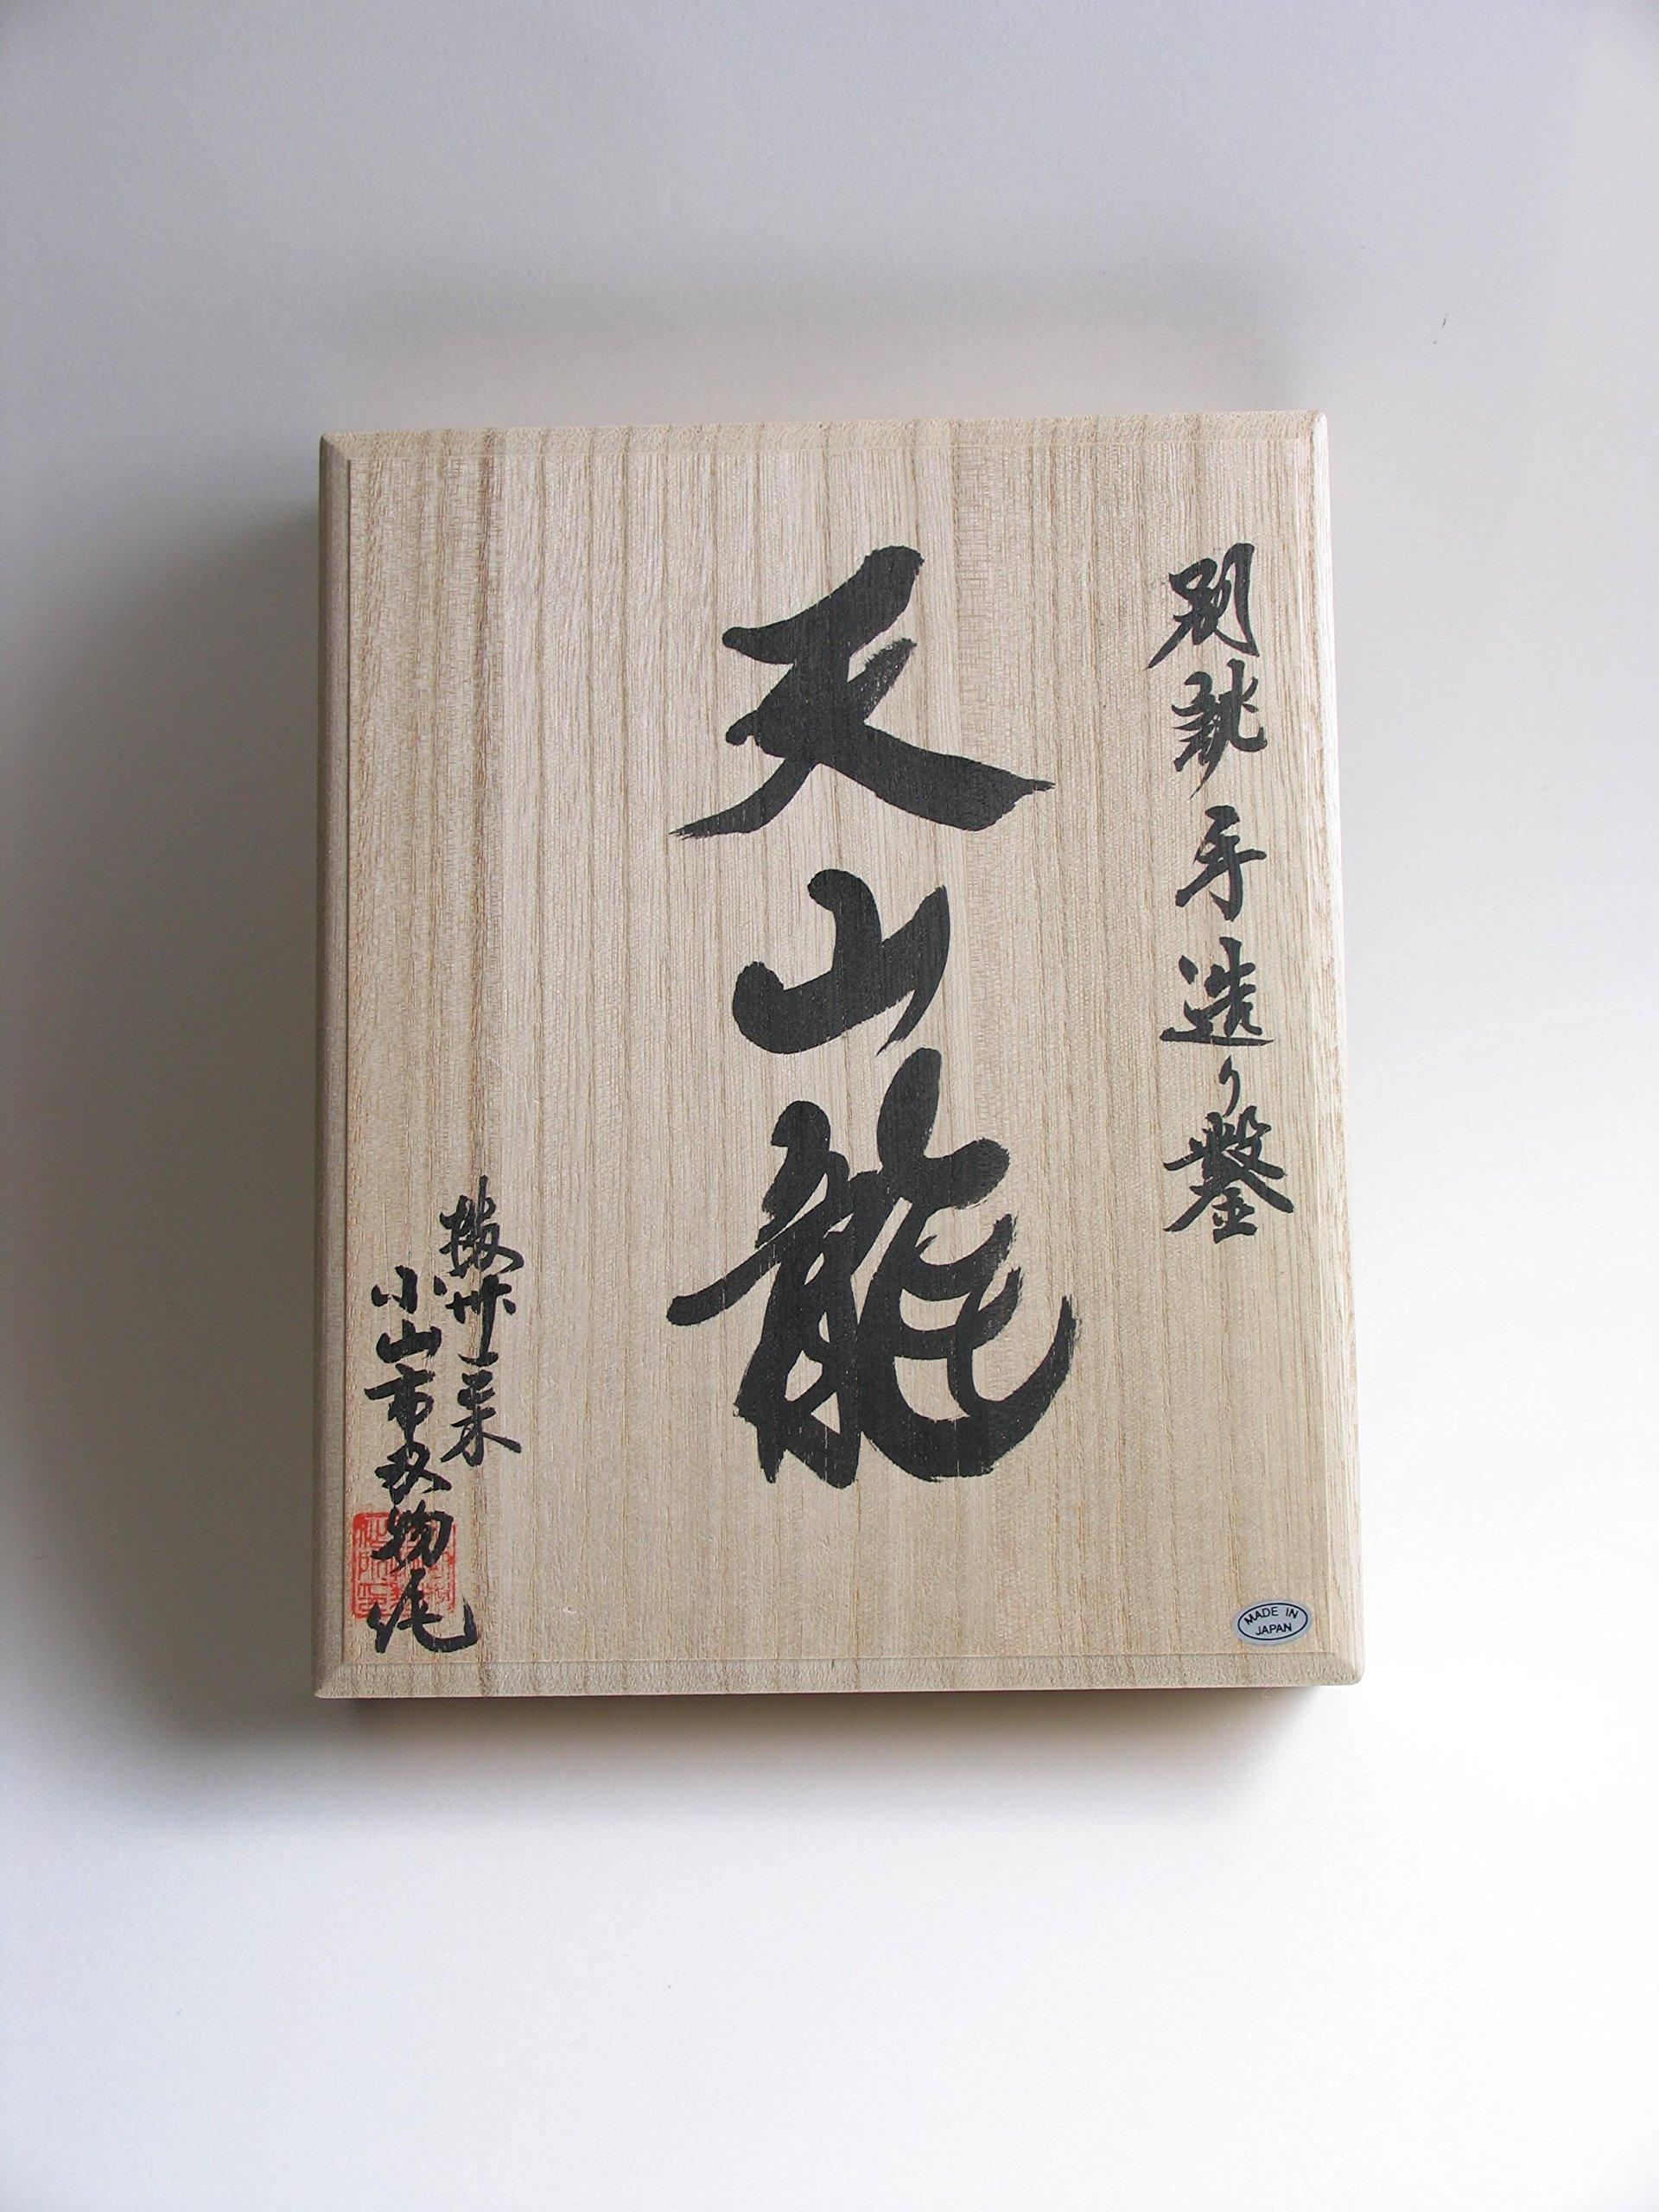 Tenzanryu Authentic Japanese Woodworking 5 Piece Chisel Set